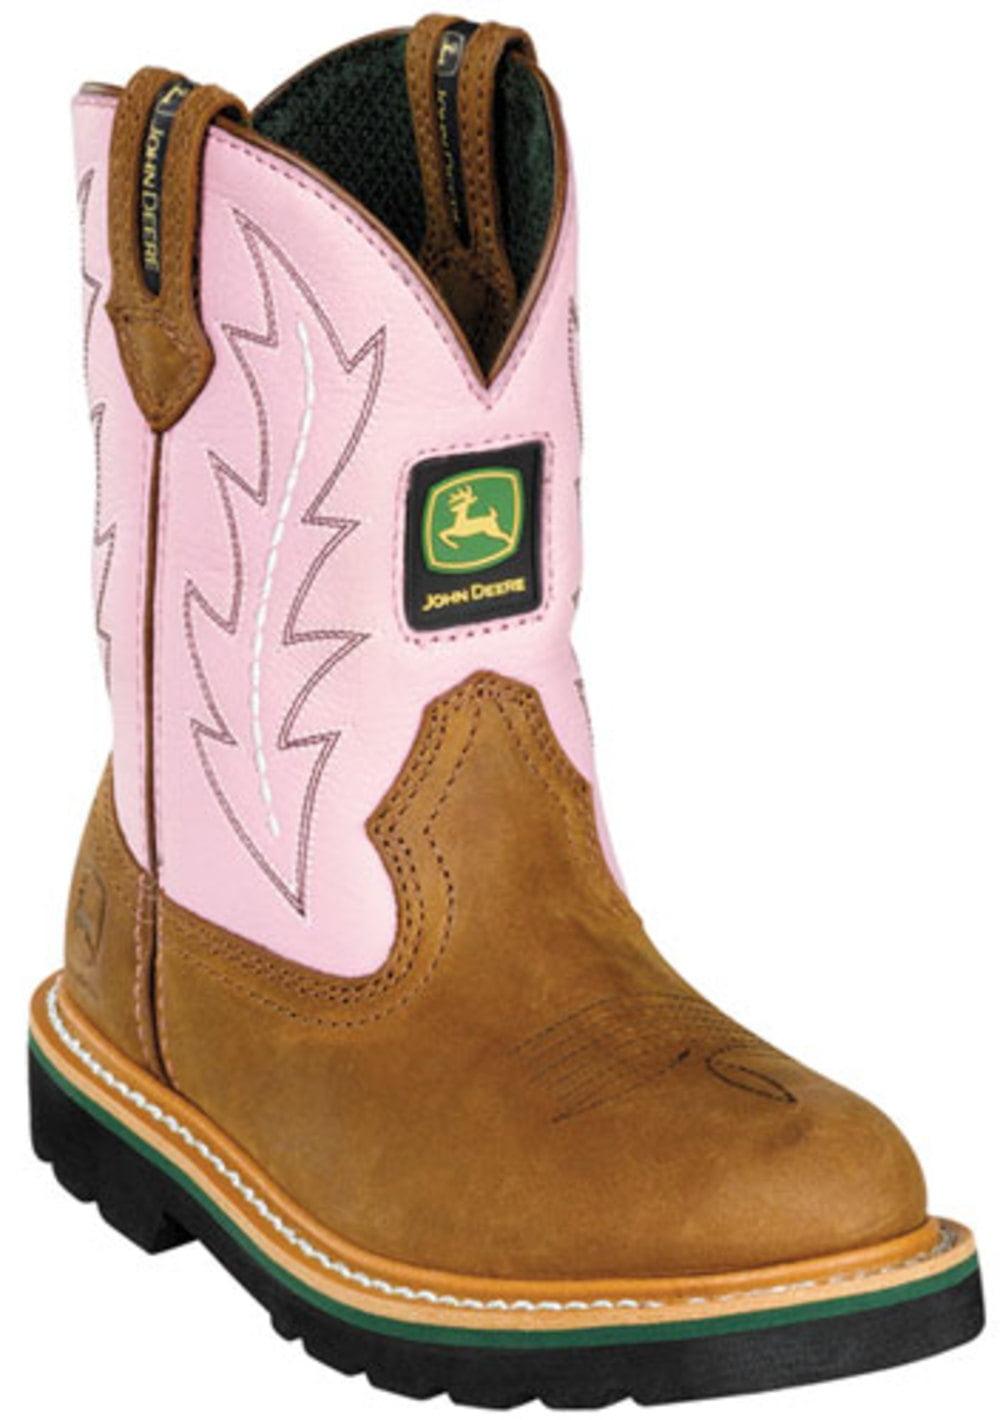 John Deere Kid's Boots Tan Pink 13 W by